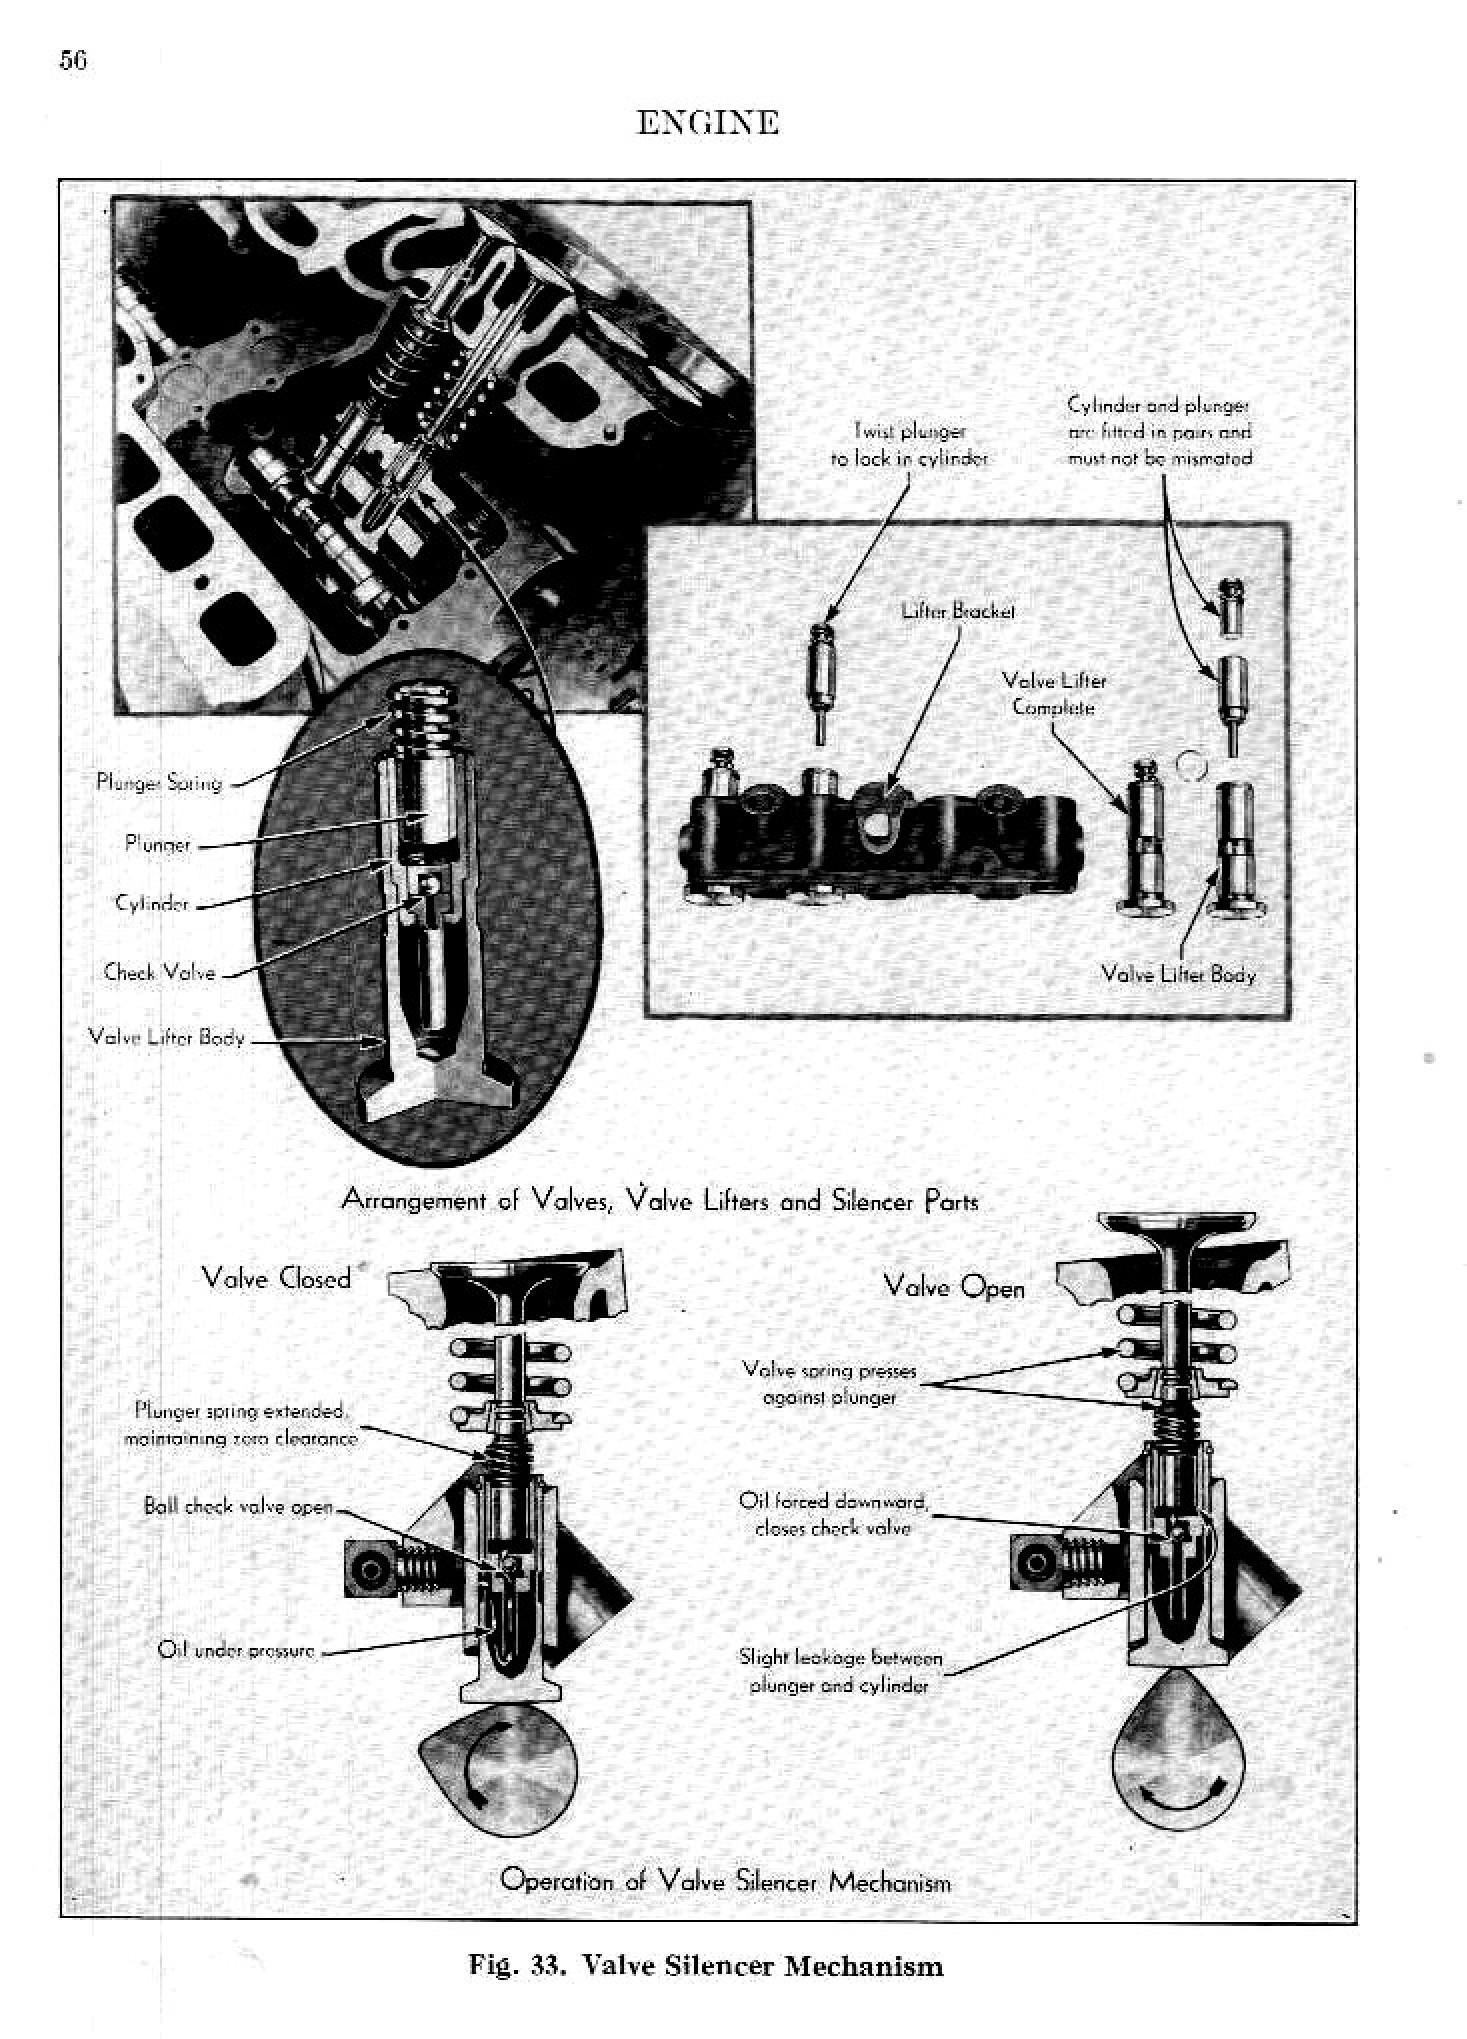 1947 Cadillac Shop Manual-Engine Page 12 of 25